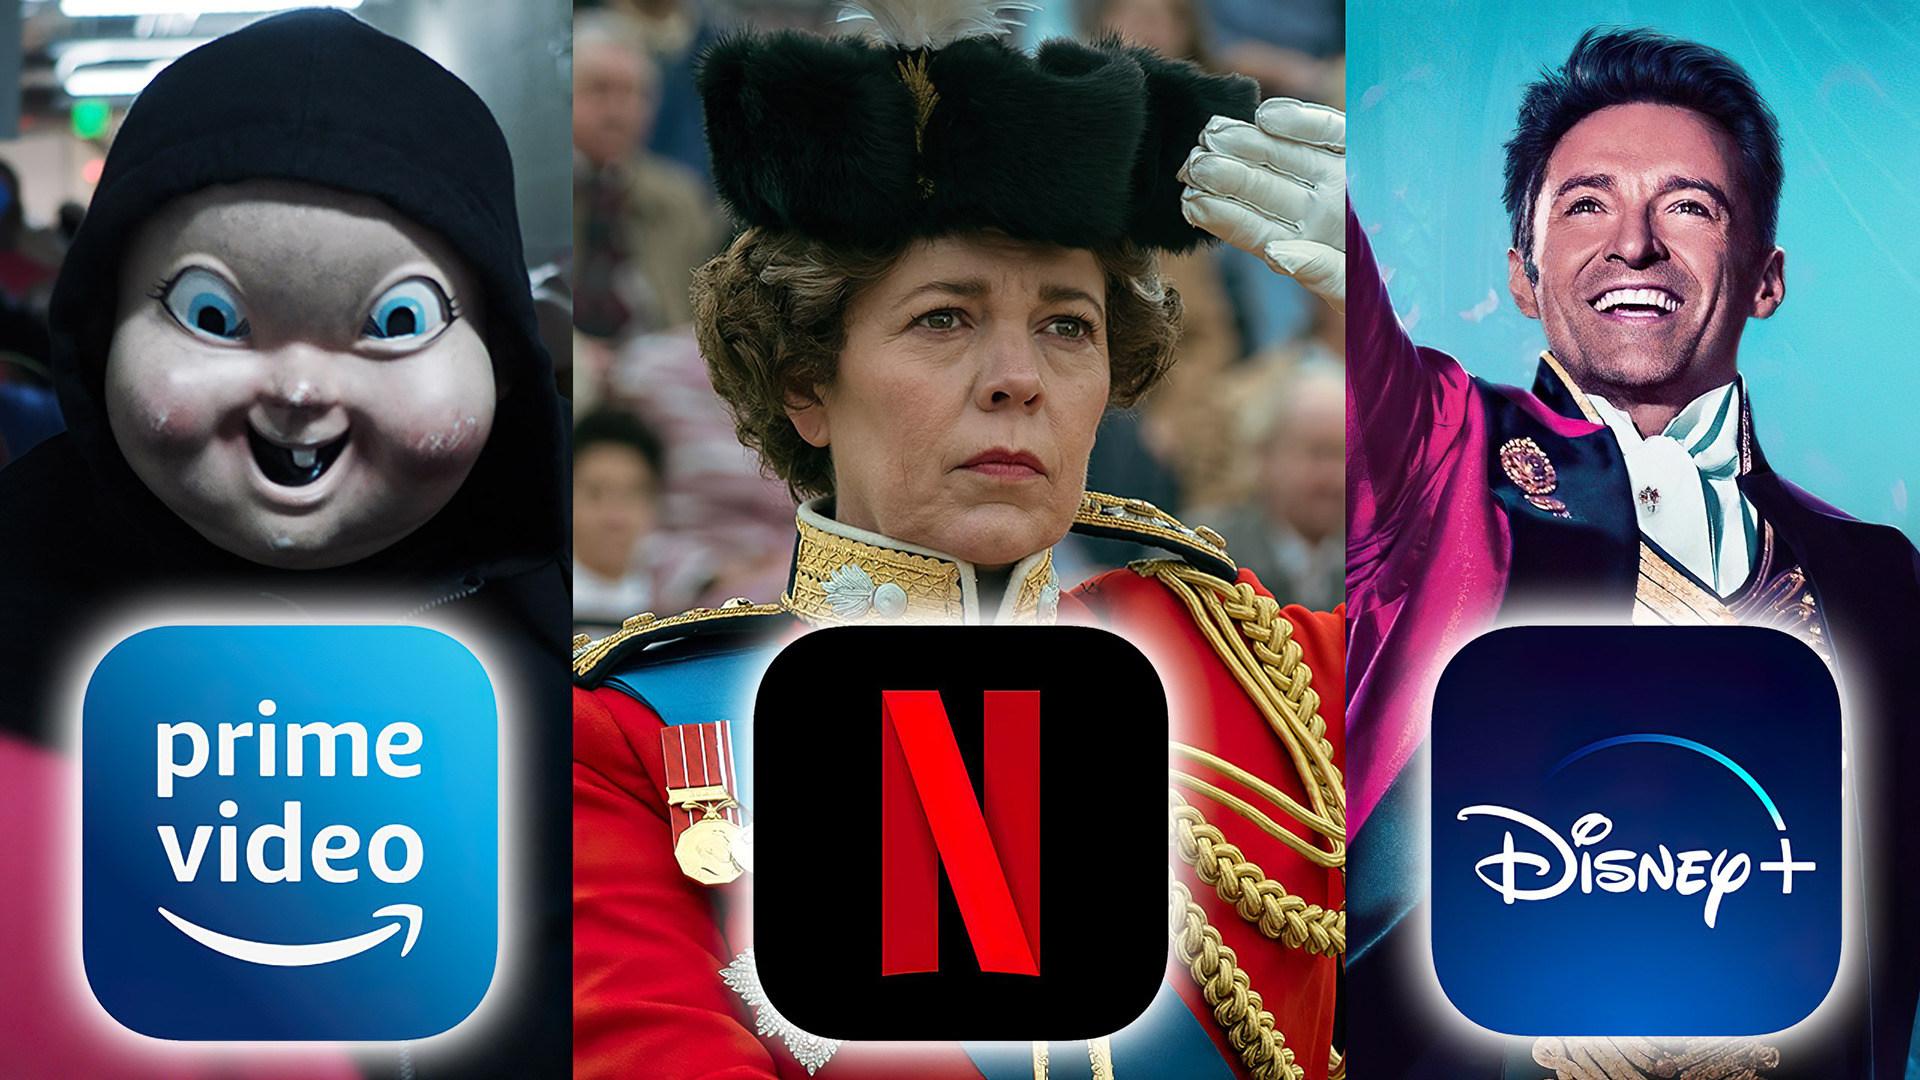 Der Pferdeflüsterer Netflix